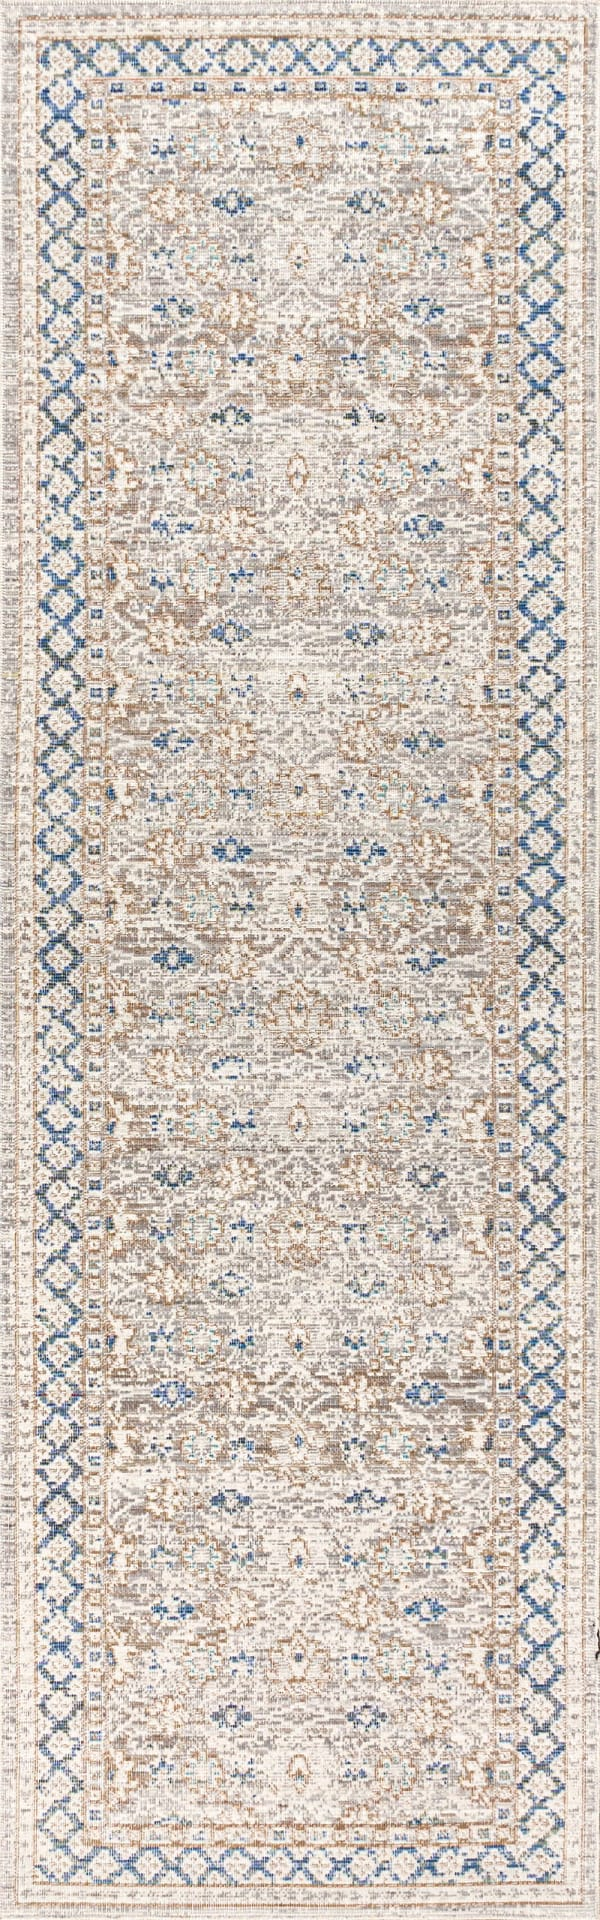 English Country Argyle Gray/Blue 2' x 8' Runner Rug